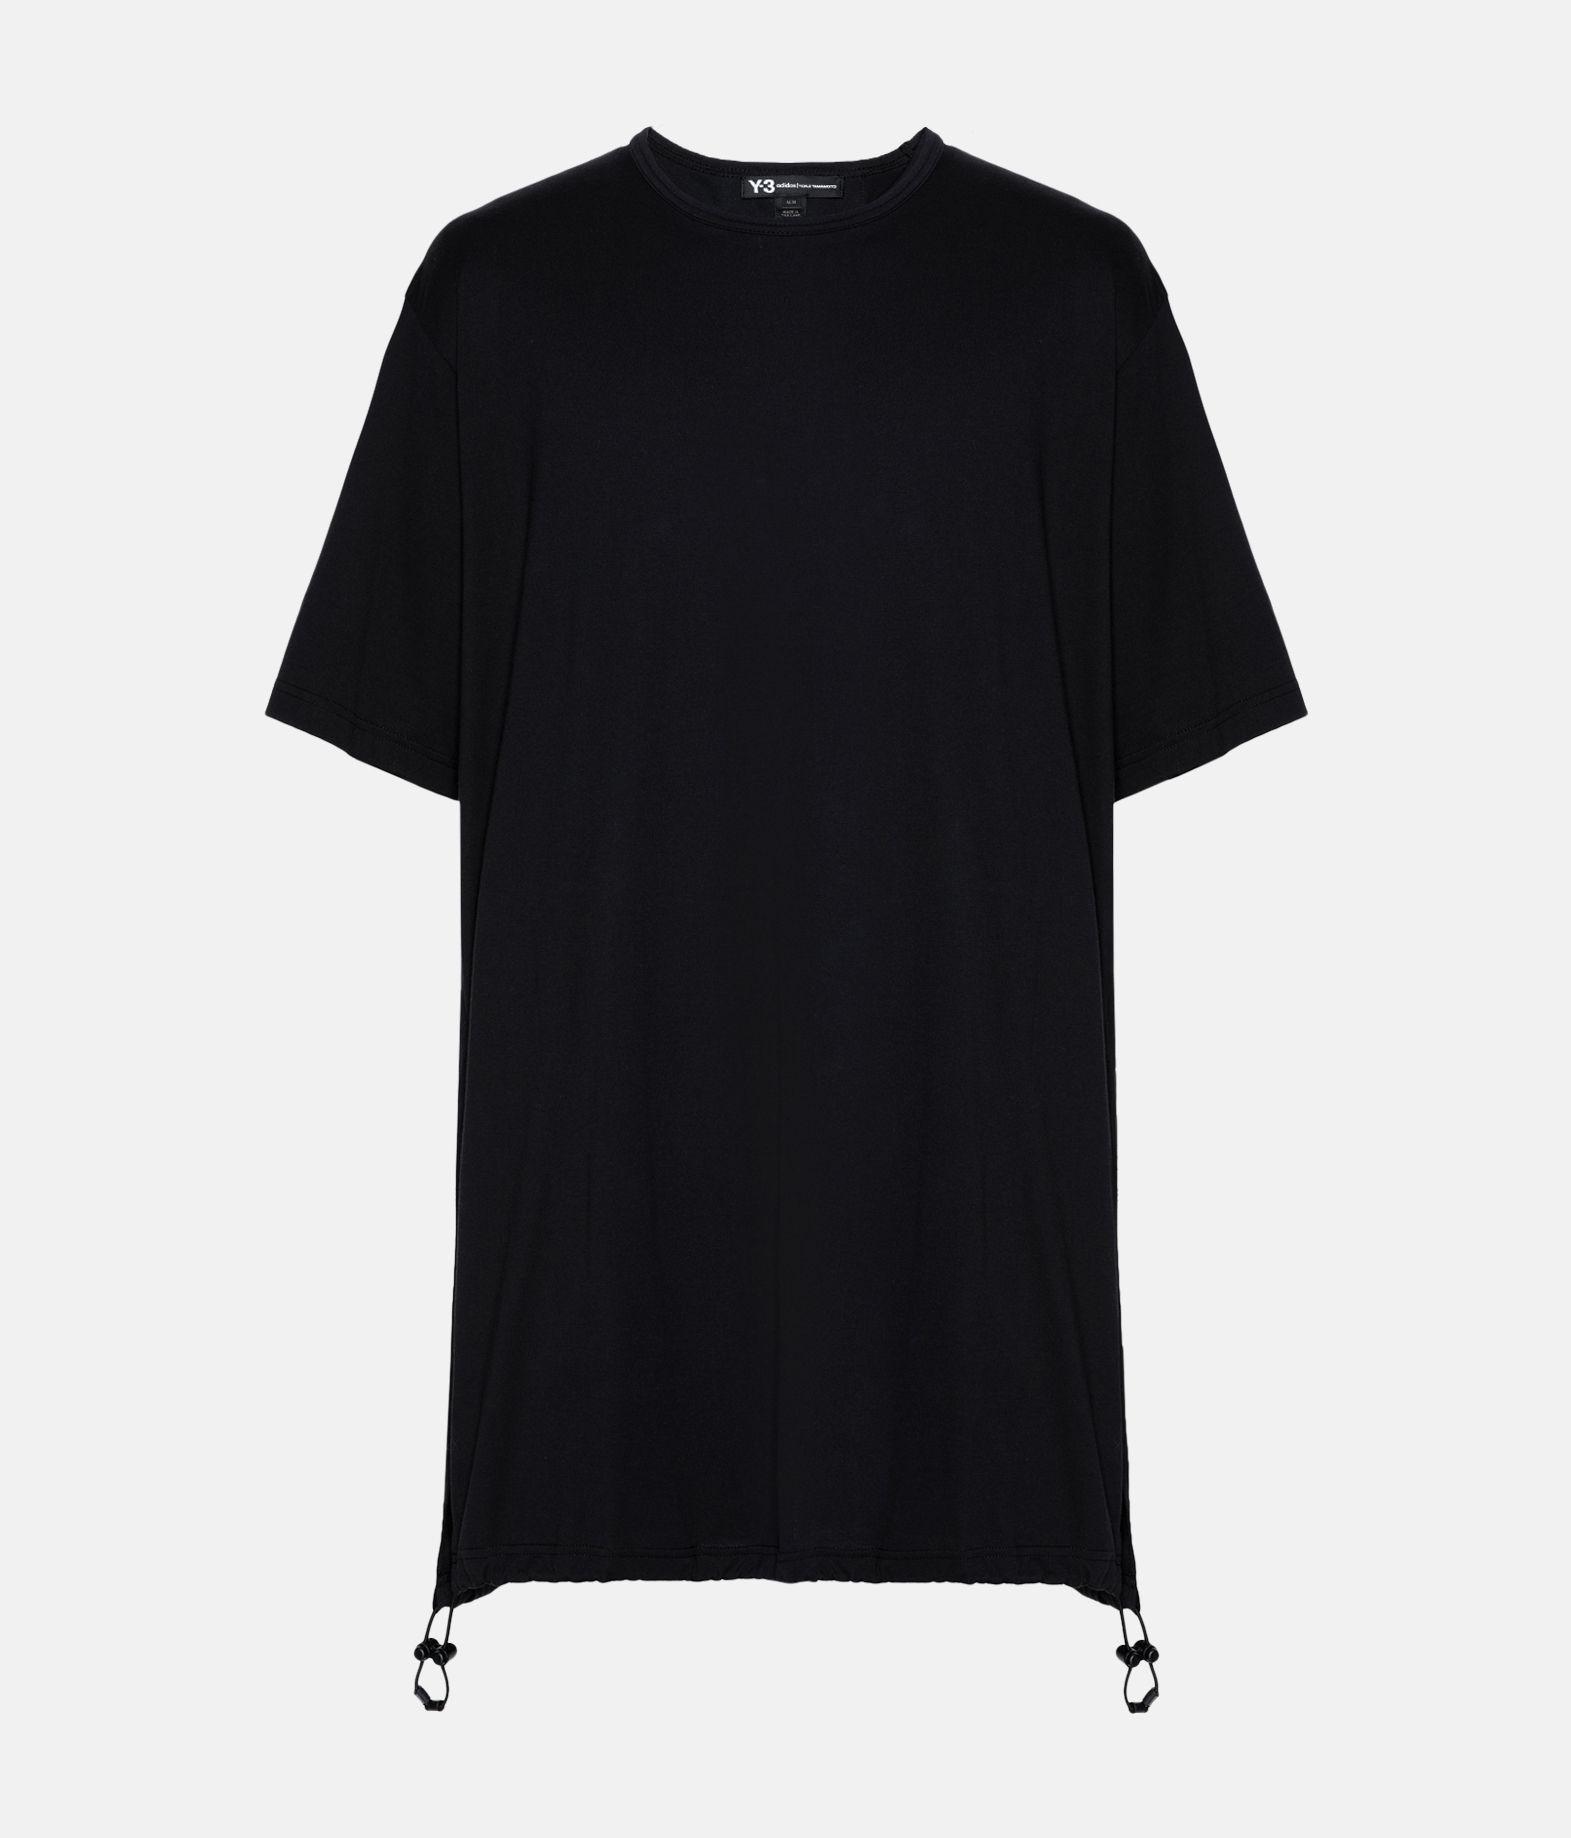 Y-3 Y-3 Drawstring Long Tee  Kurzärmliges T-shirt Herren f